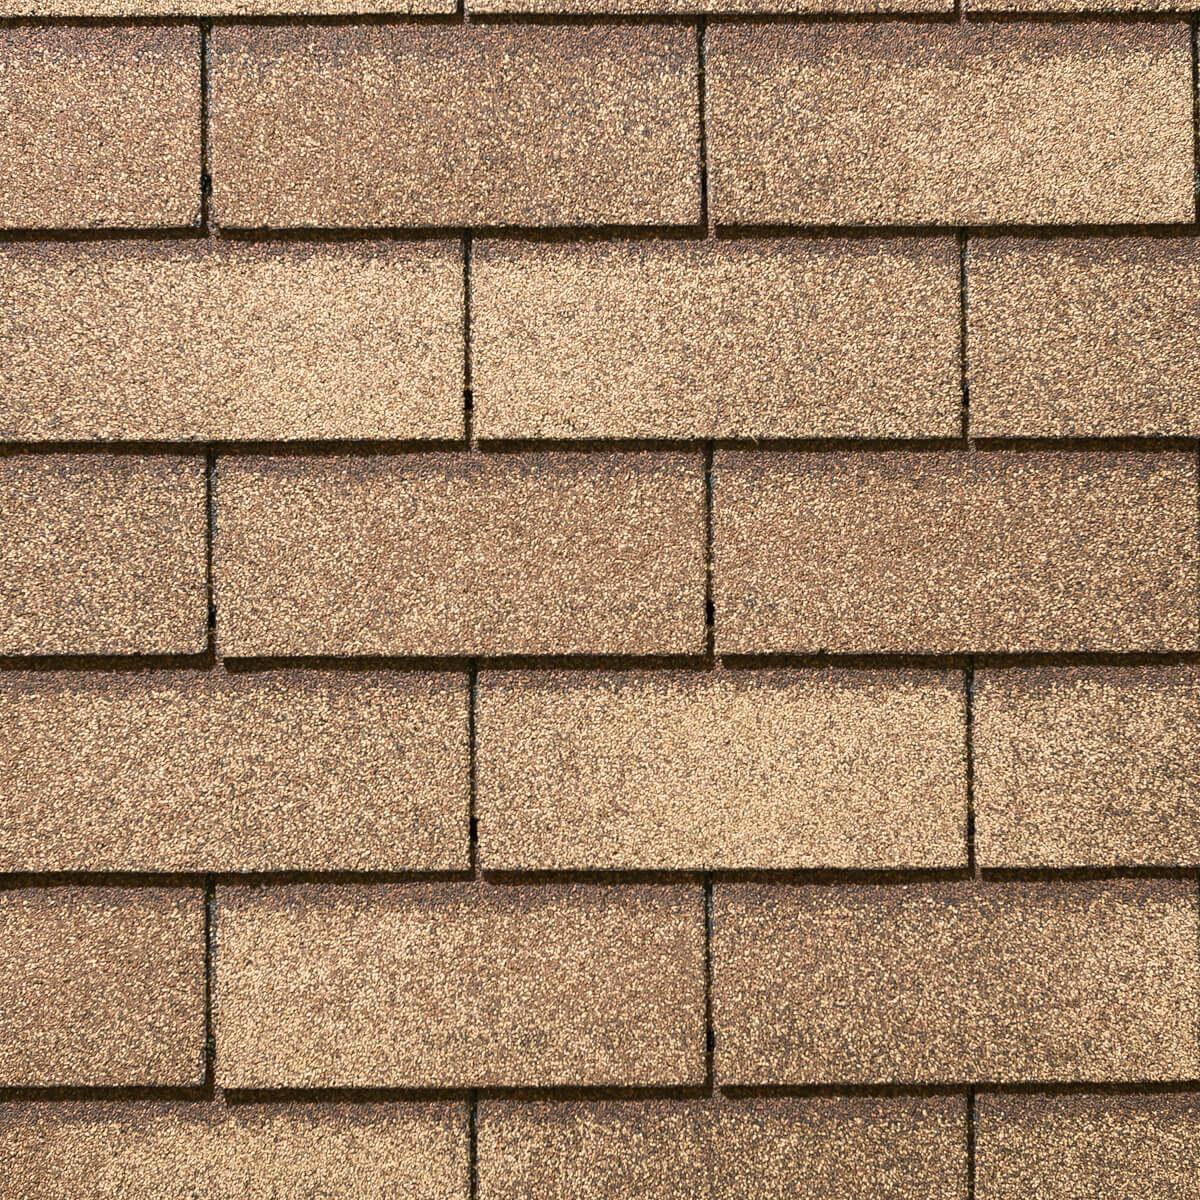 Yukon 3-tab Roofing Shingles - Sunset Cedar